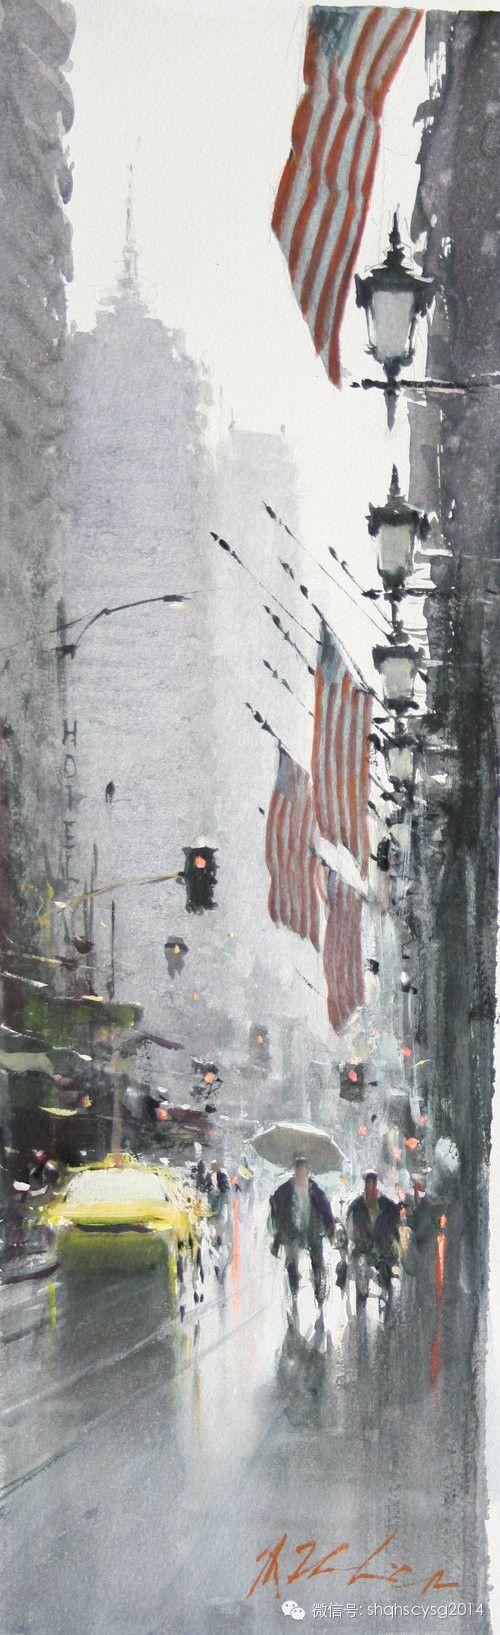 《JOSEPH ZBUKVIC 約瑟夫∙祖布克維克水彩畫展》4月25日隆重開幕!(水彩人生博客) - 水彩人生 - | Cityscape art